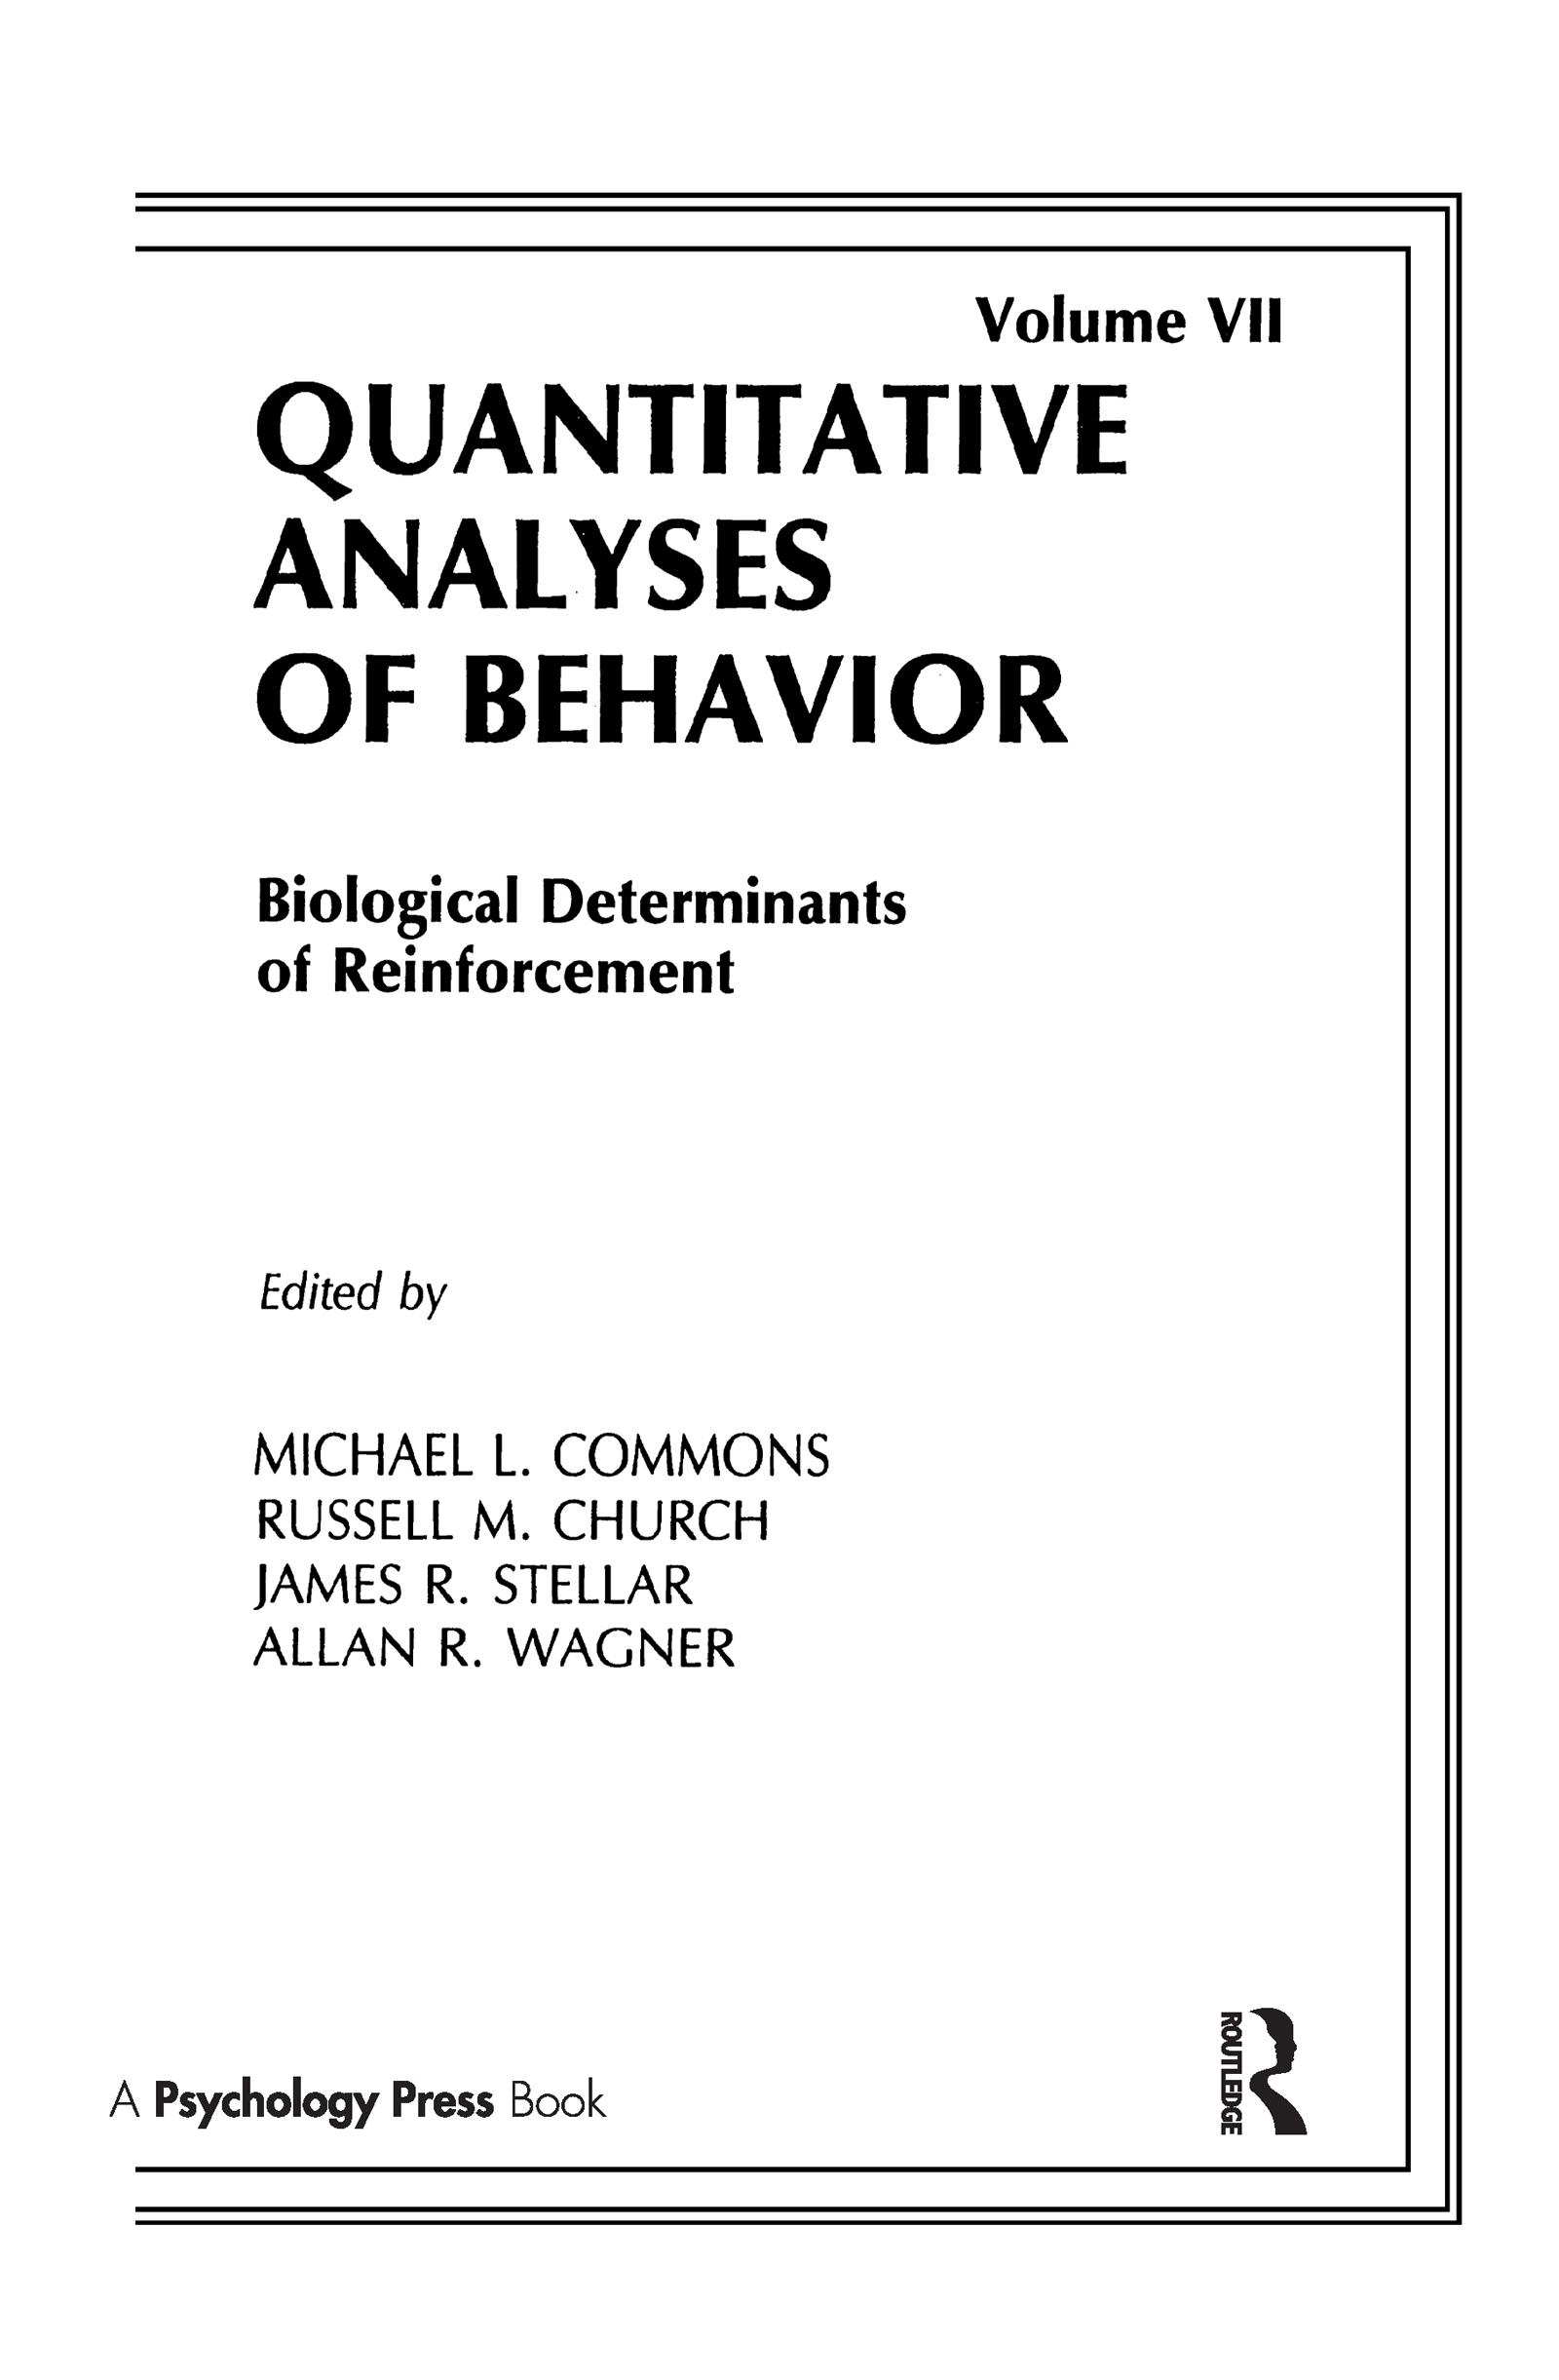 Biological Determinants of Reinforcement: Biological Determinates of Reinforcement book cover